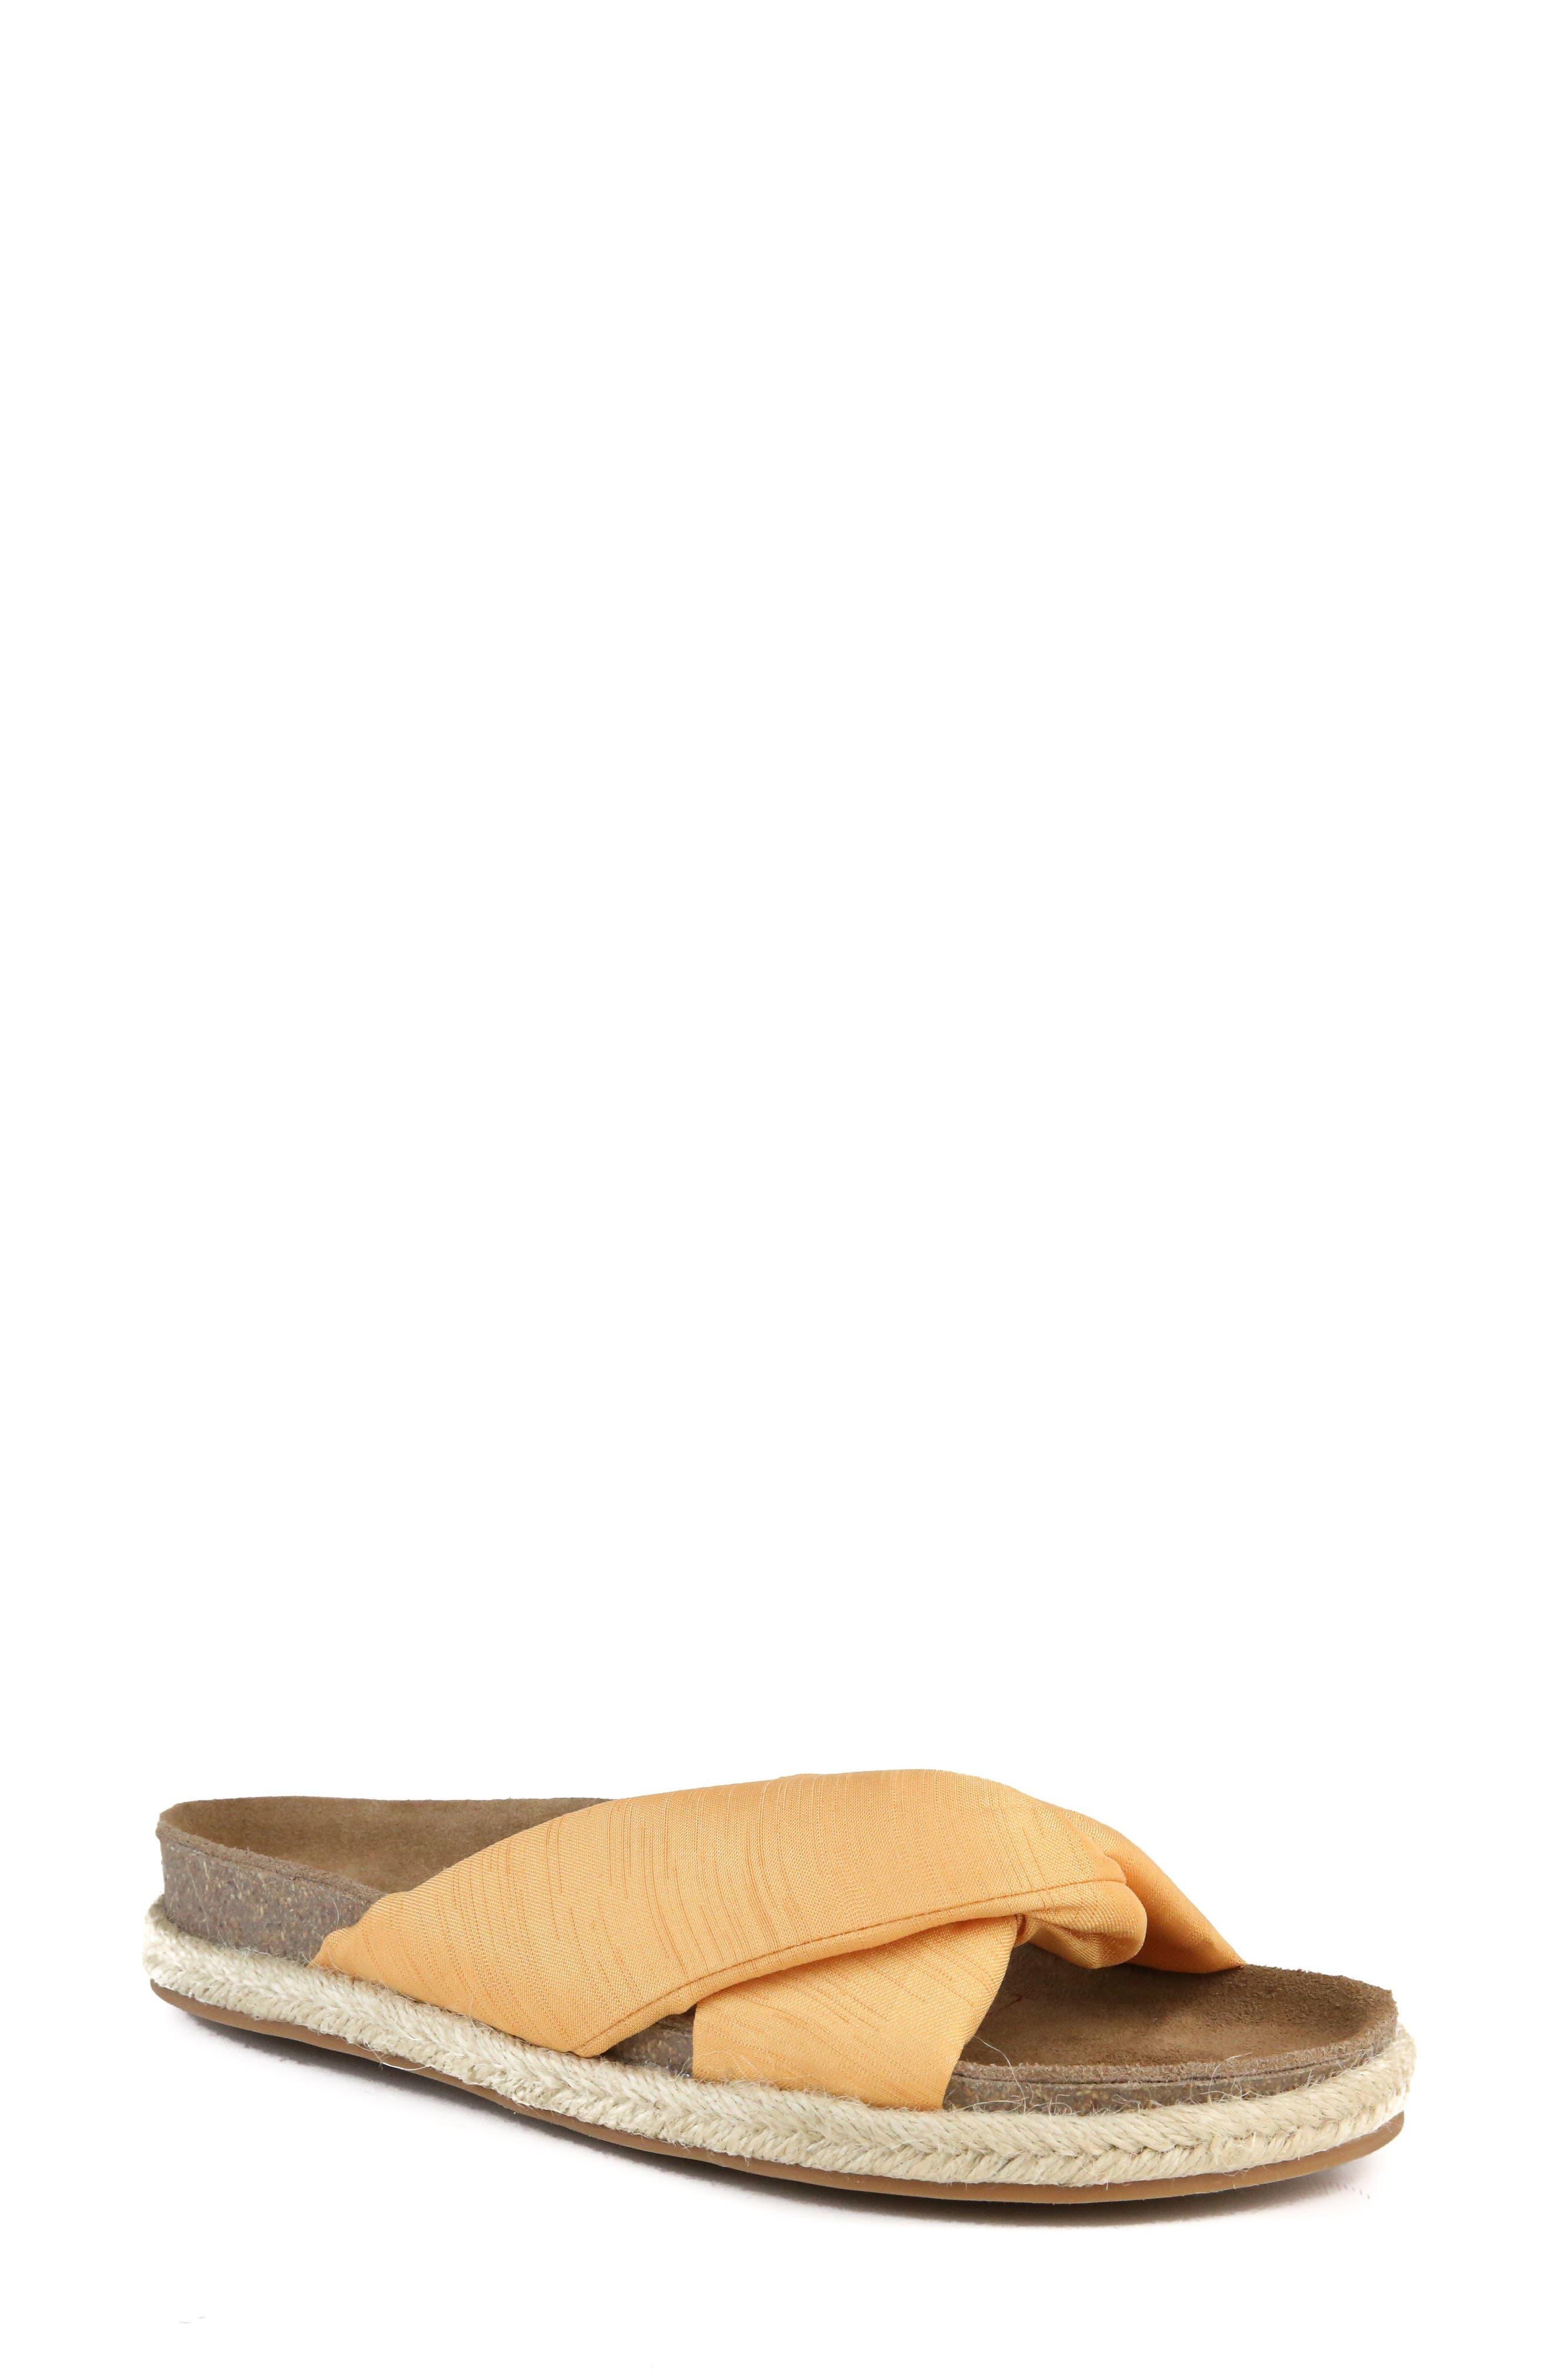 Move Over Slide Sandal, Orange